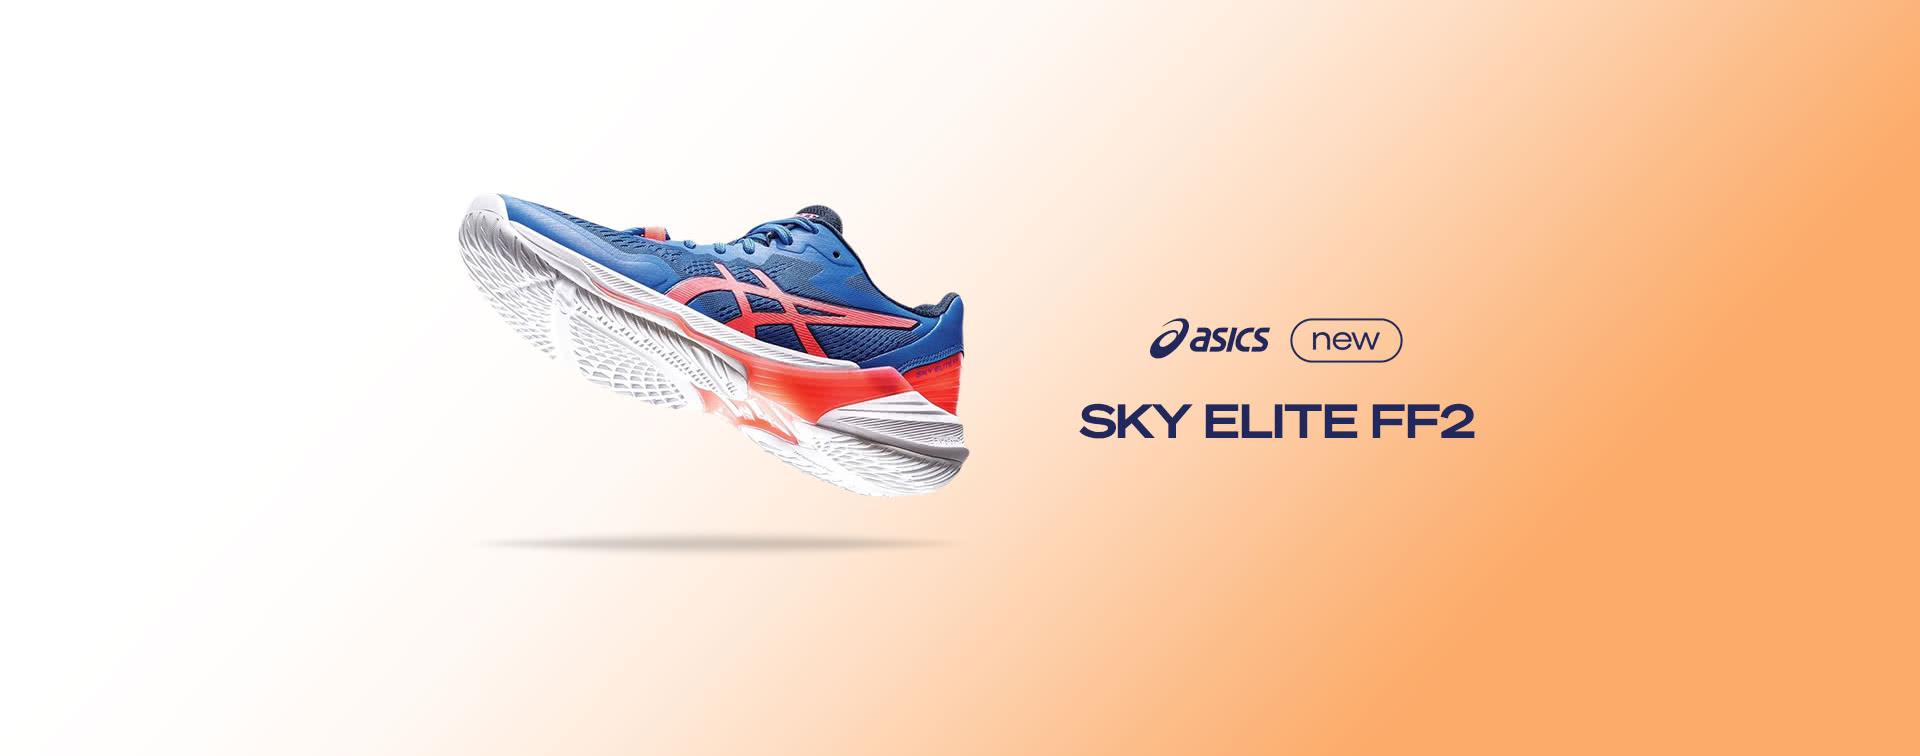 Asics Gel Sky Elite Volleyball Schuhe